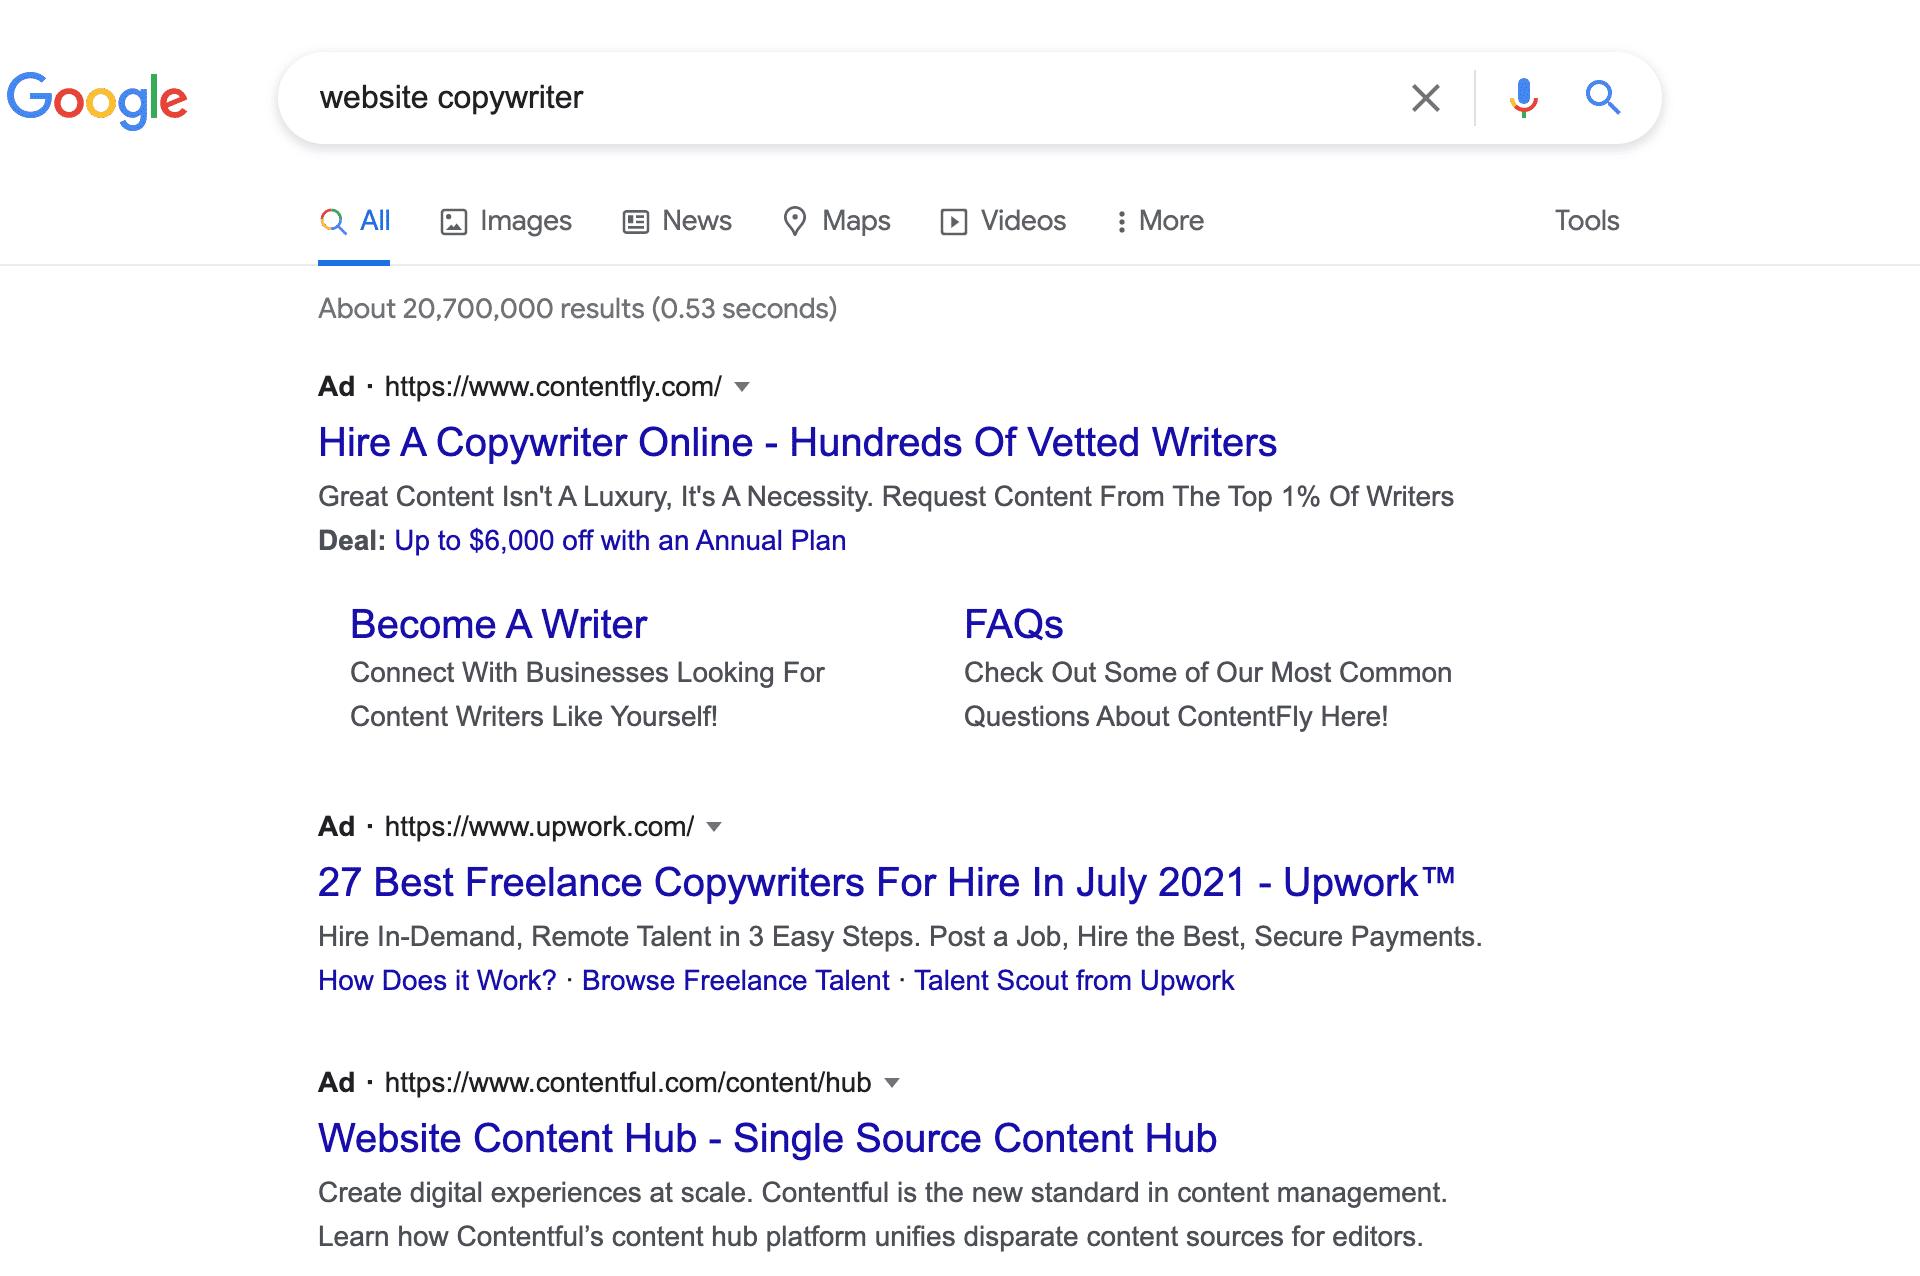 Google website copywriter